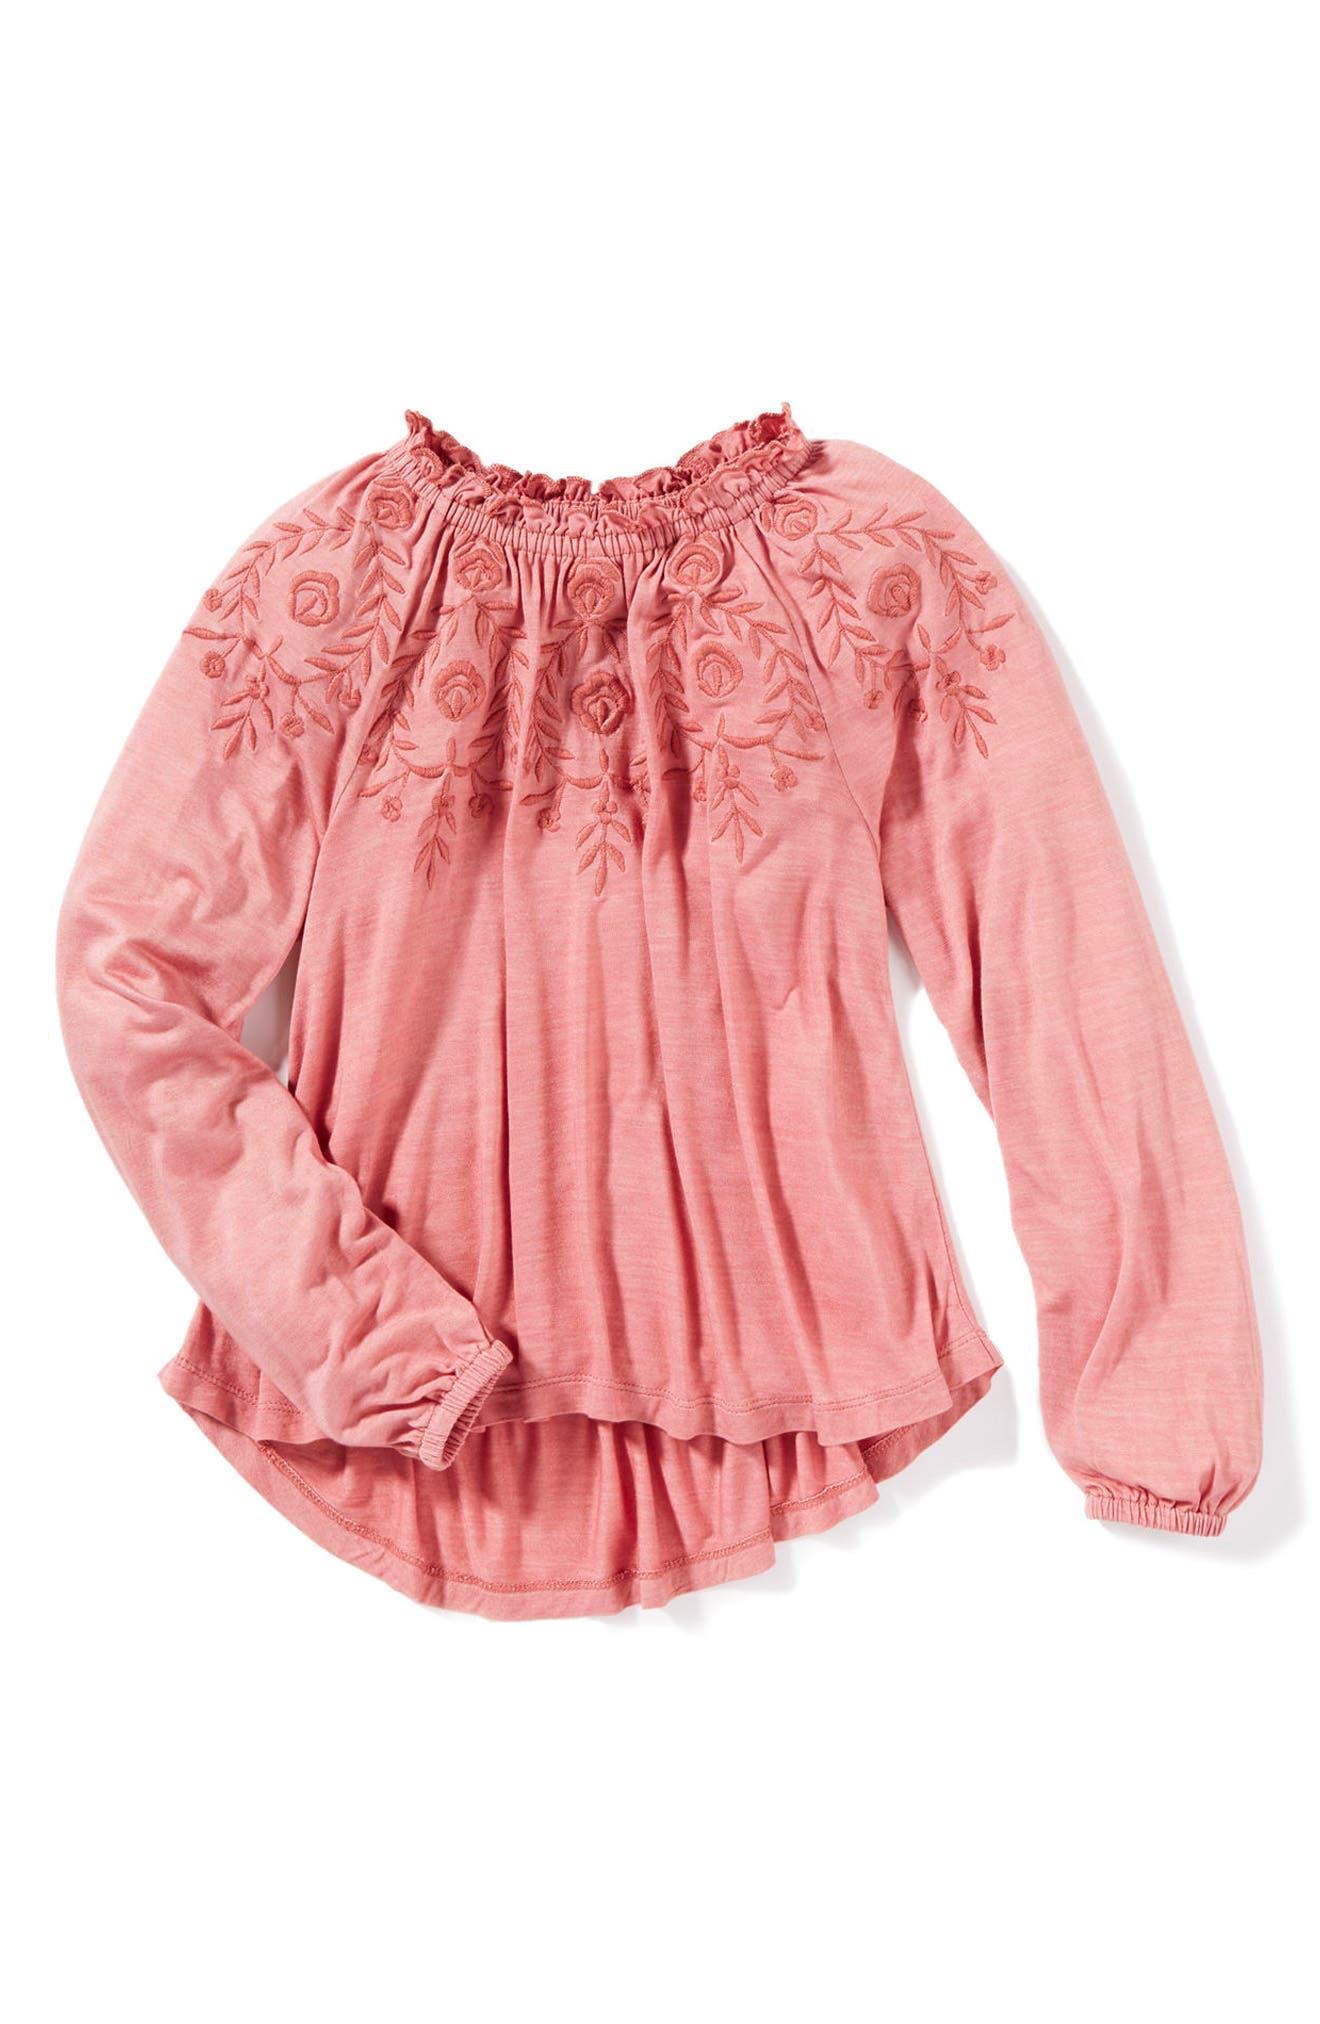 Peek May Embroidered Top (Toddler Girls, Little Girls & Big Girls)